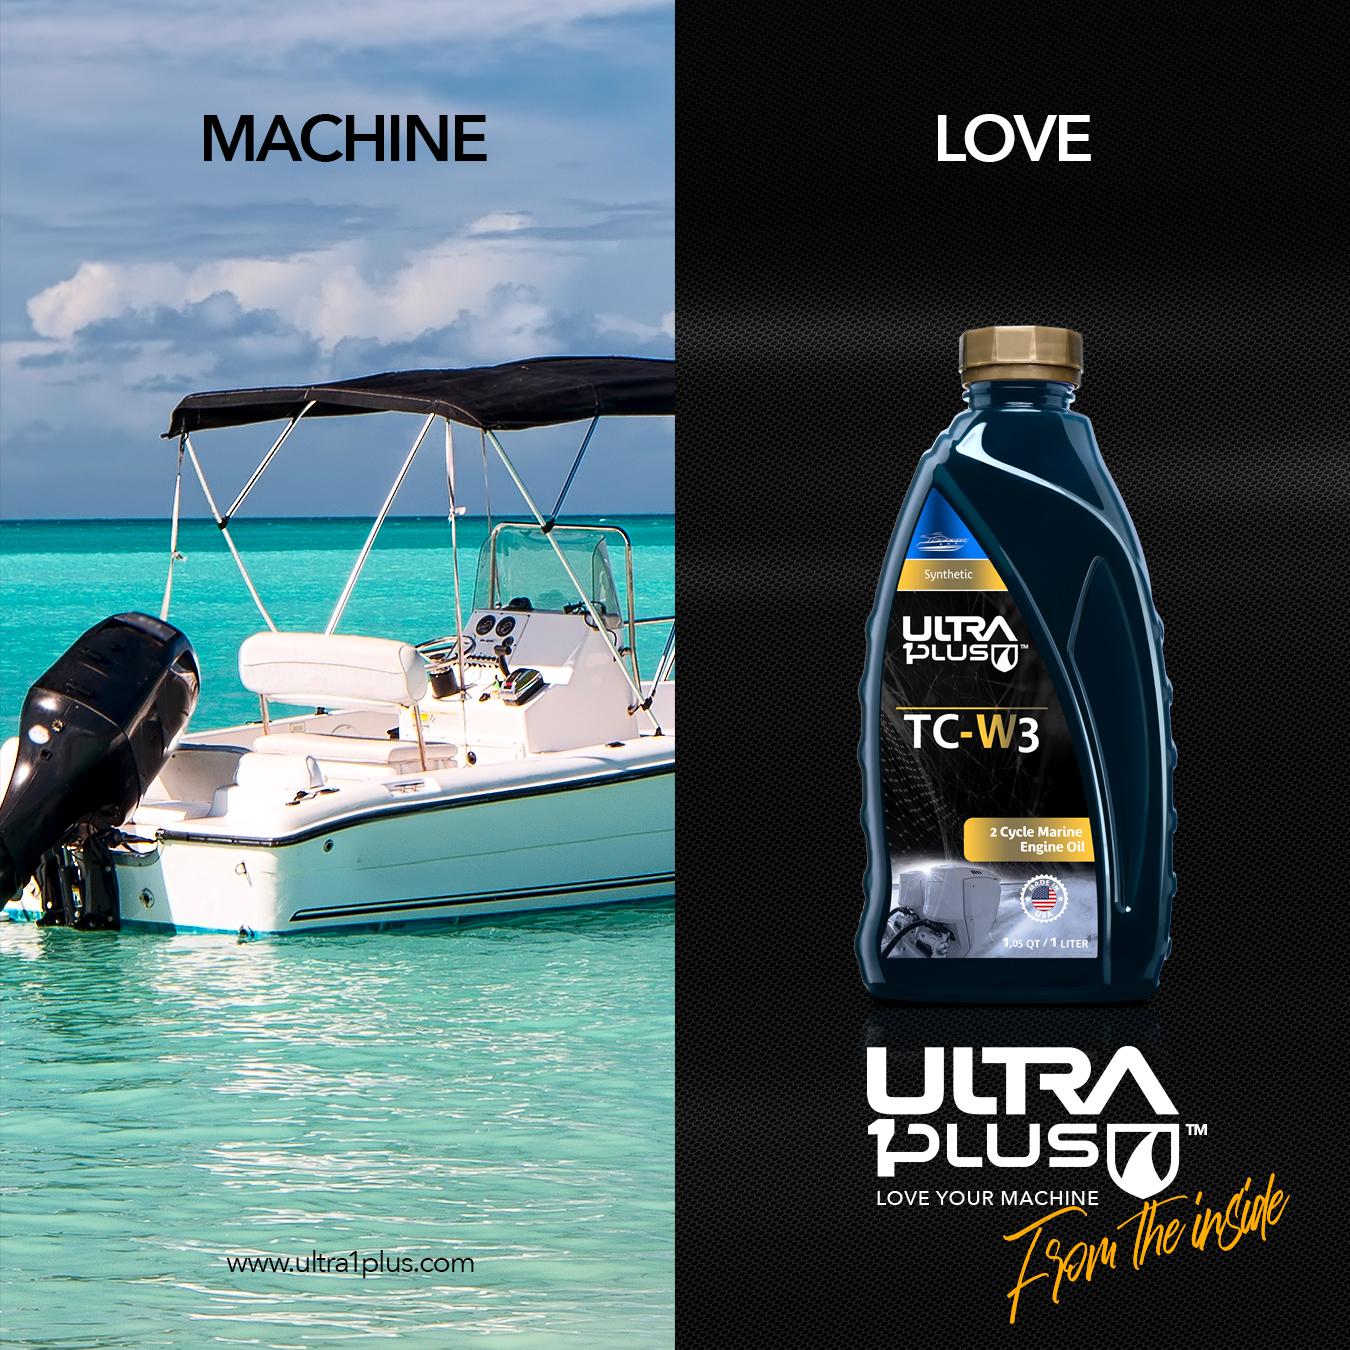 w03-005-prod-marine-love1.jpg